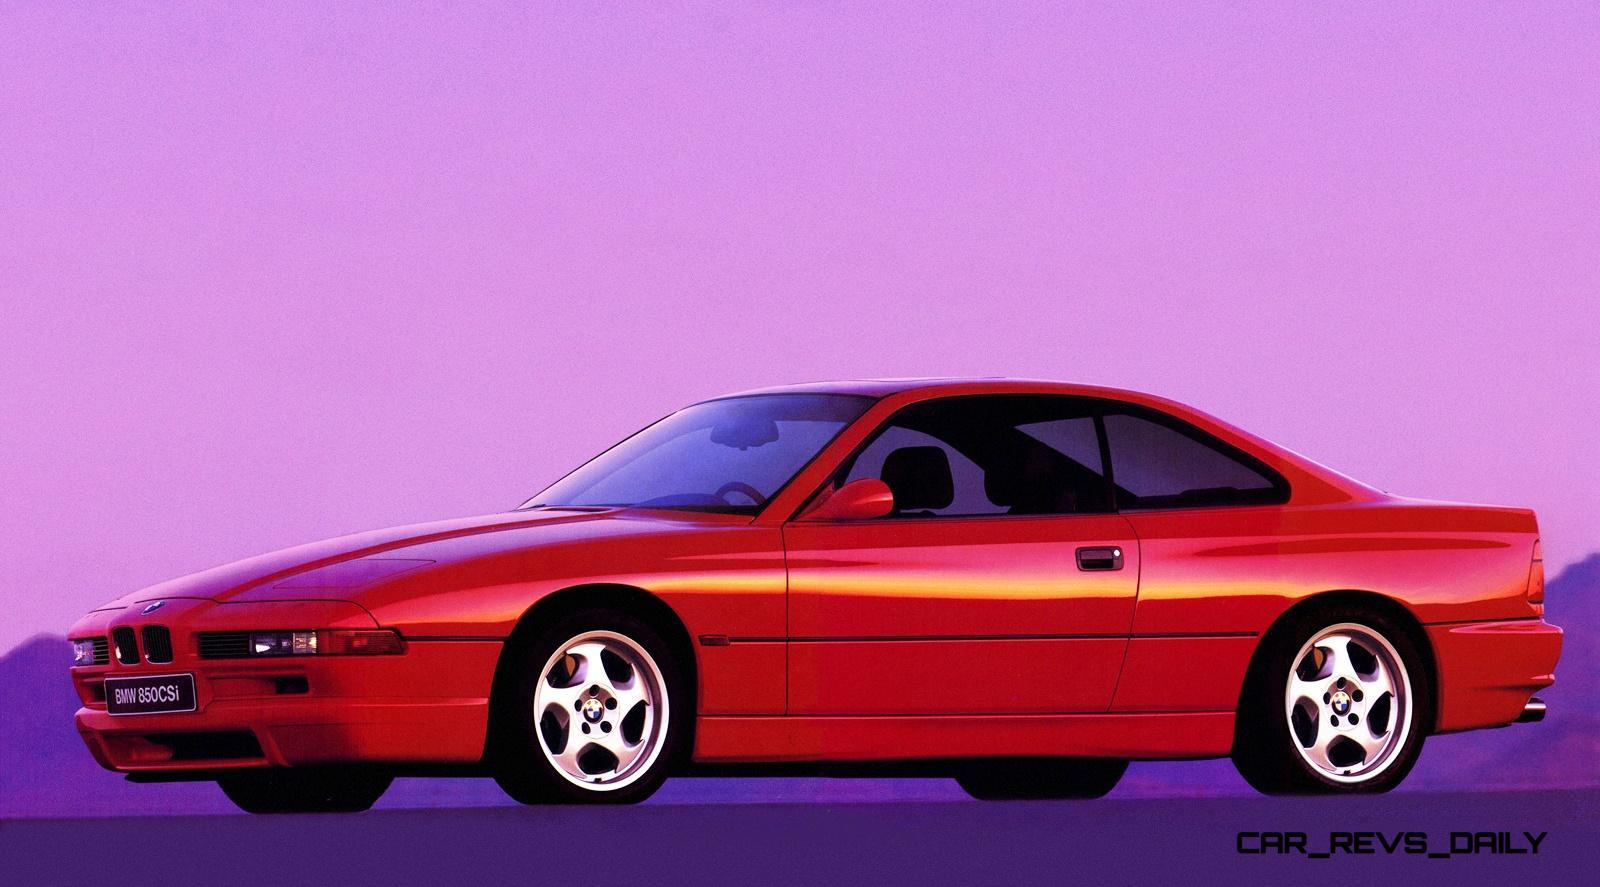 Bmw E31 840i 850i And 850csi Celebrate 25th Anniversary